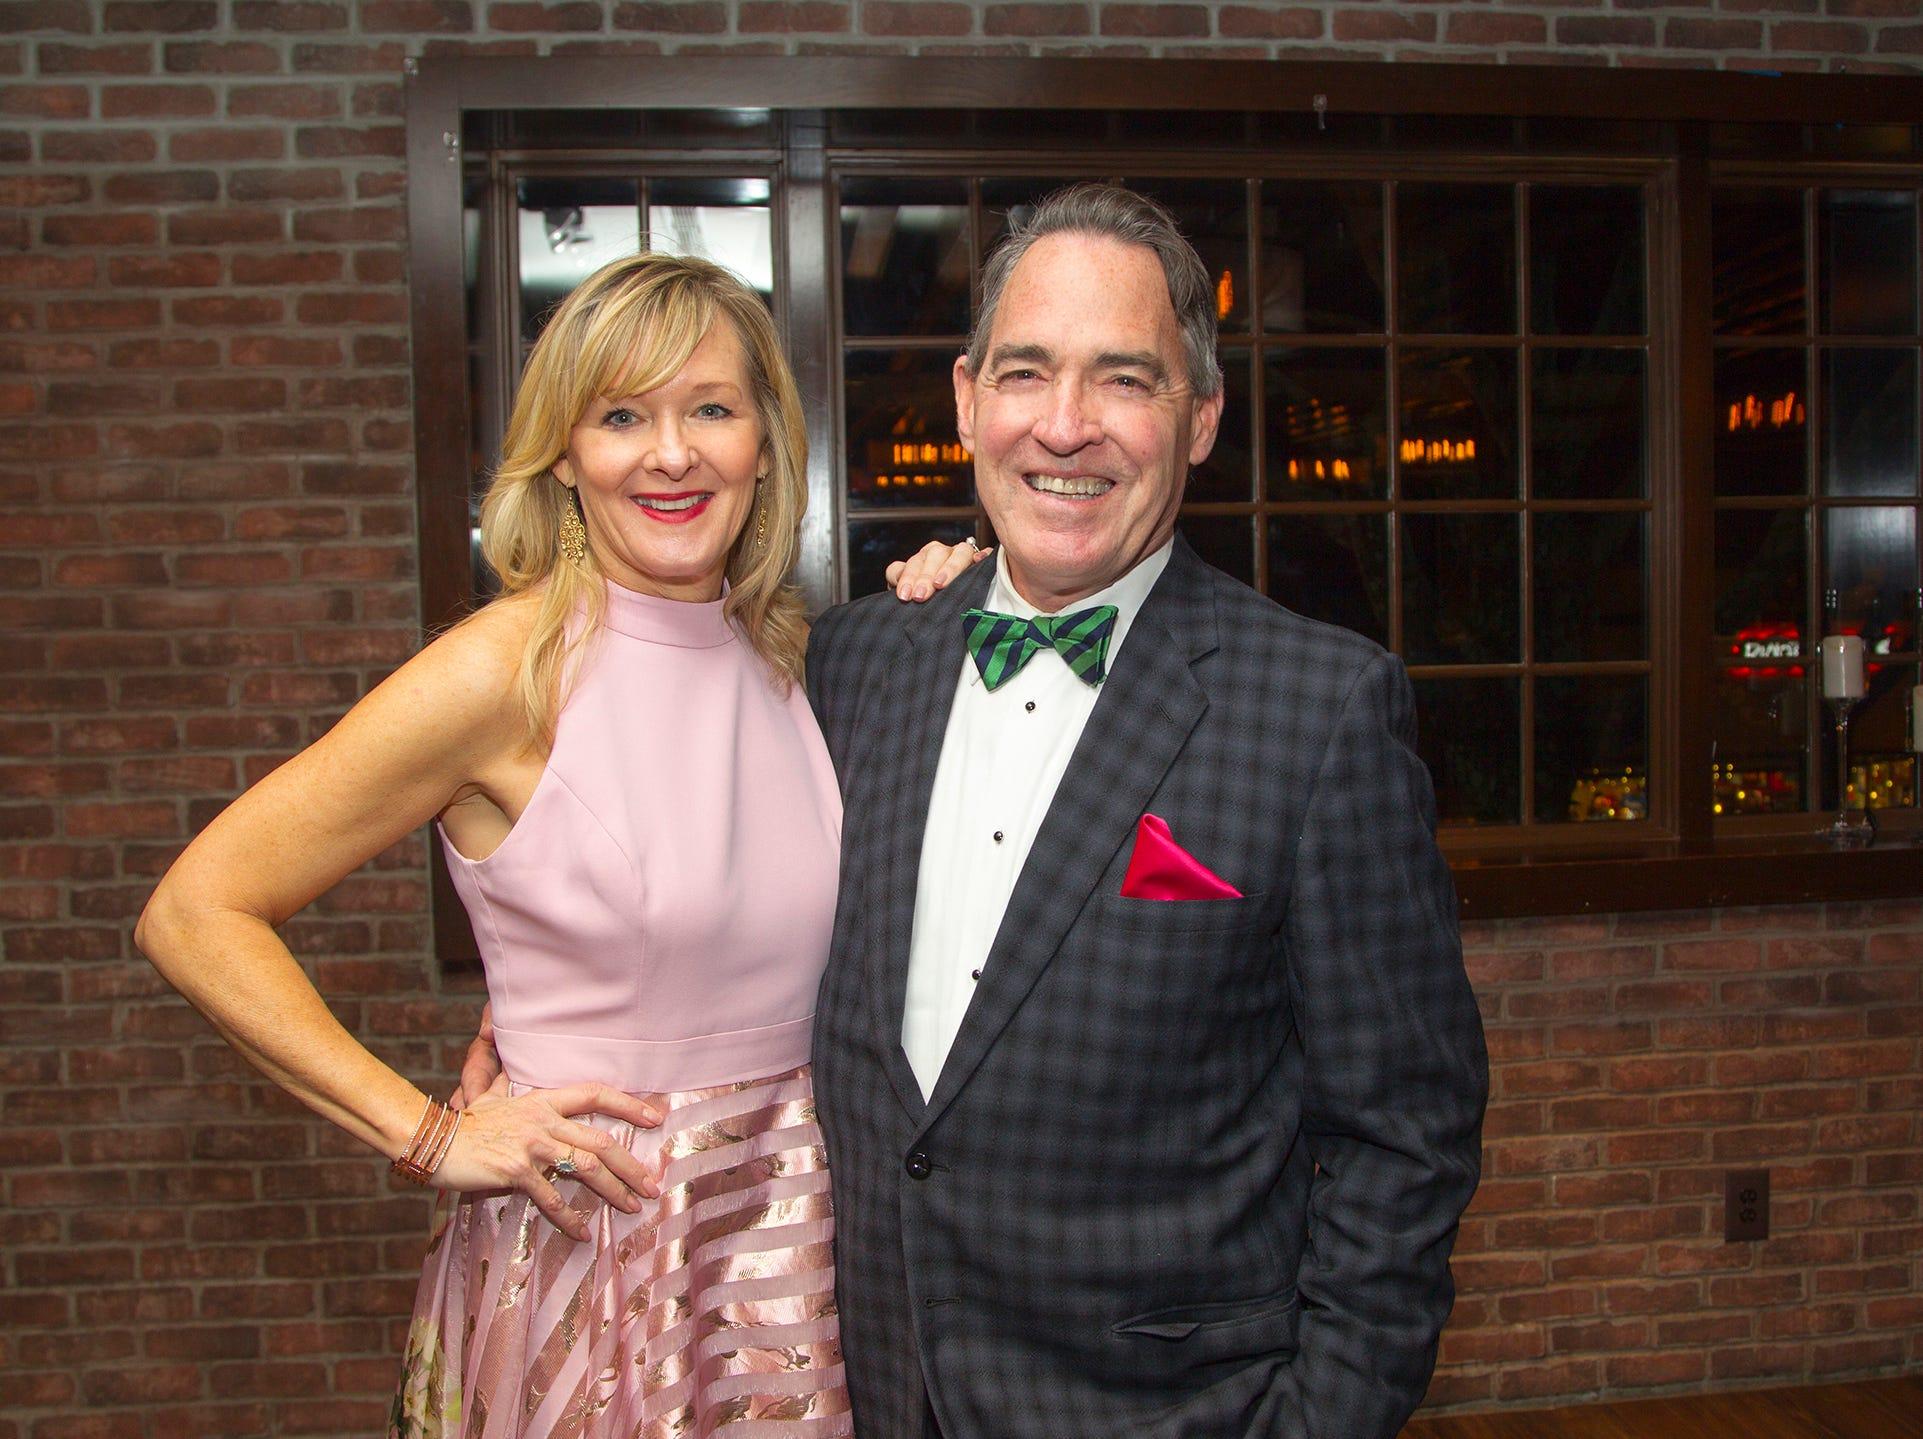 Rosie and Sean McCooe. Ridgewood High School 2019 Jamboree after party at Park West Loft in Ridgewood.  2/9/2019